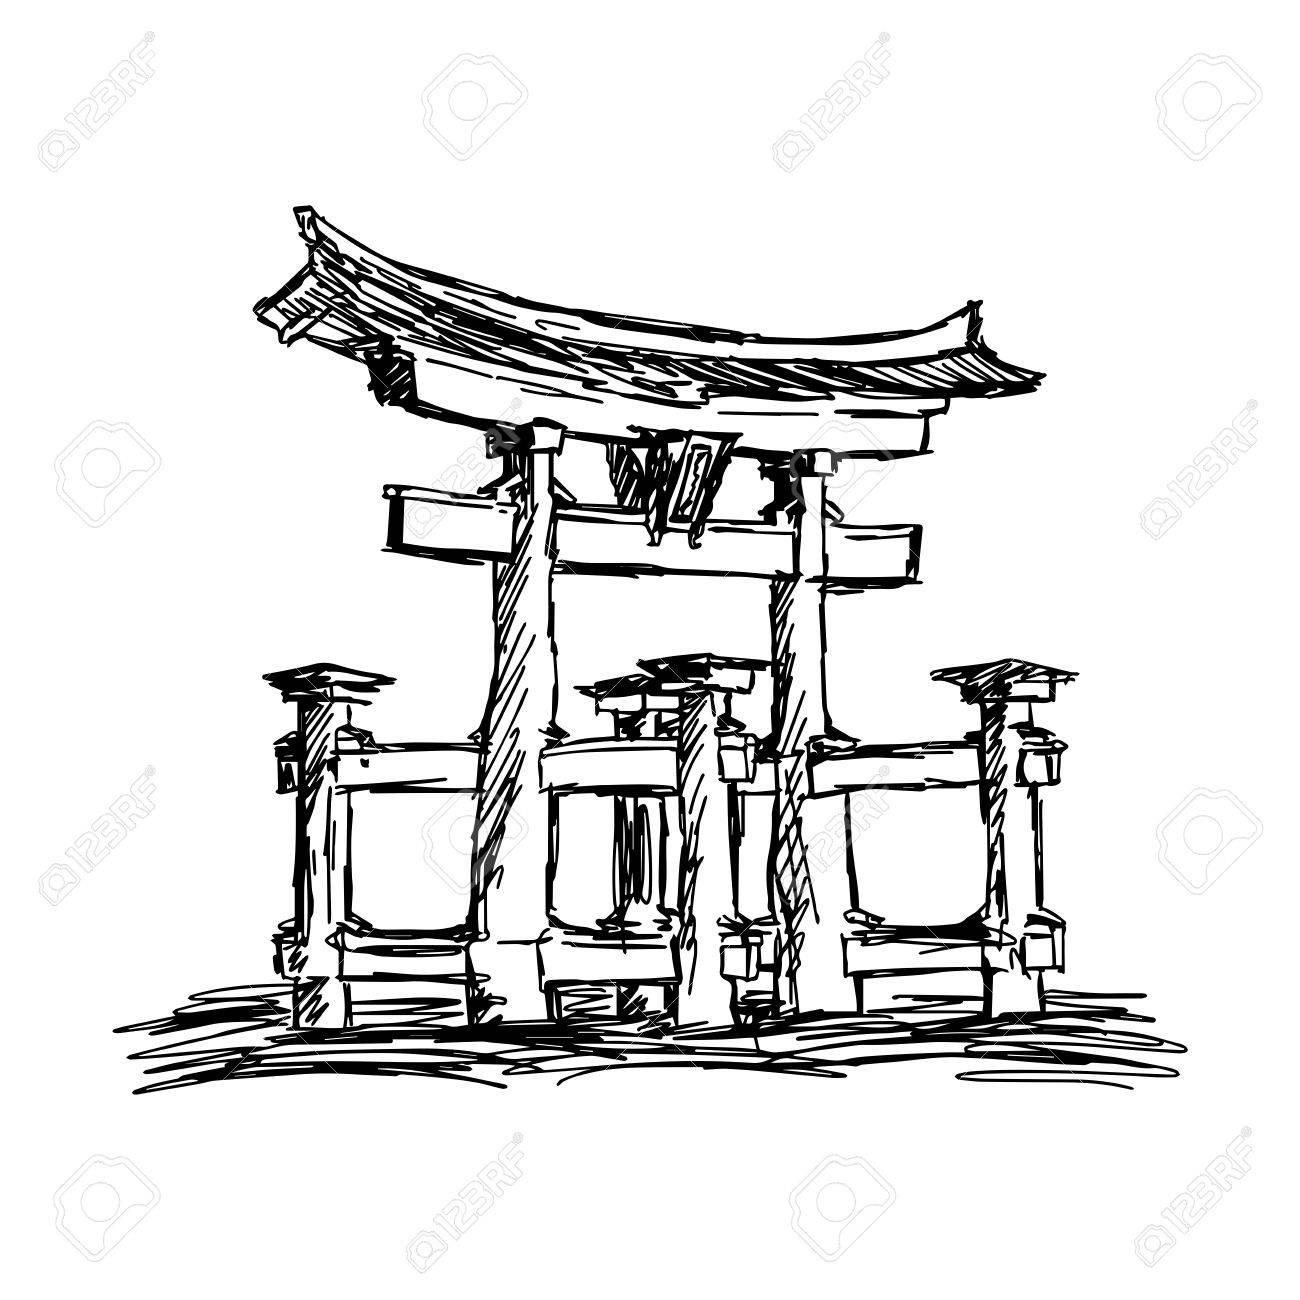 1300x1300 Illustration Vector Doodle Hand Drawn Of Sketch Itsukushima Shrine